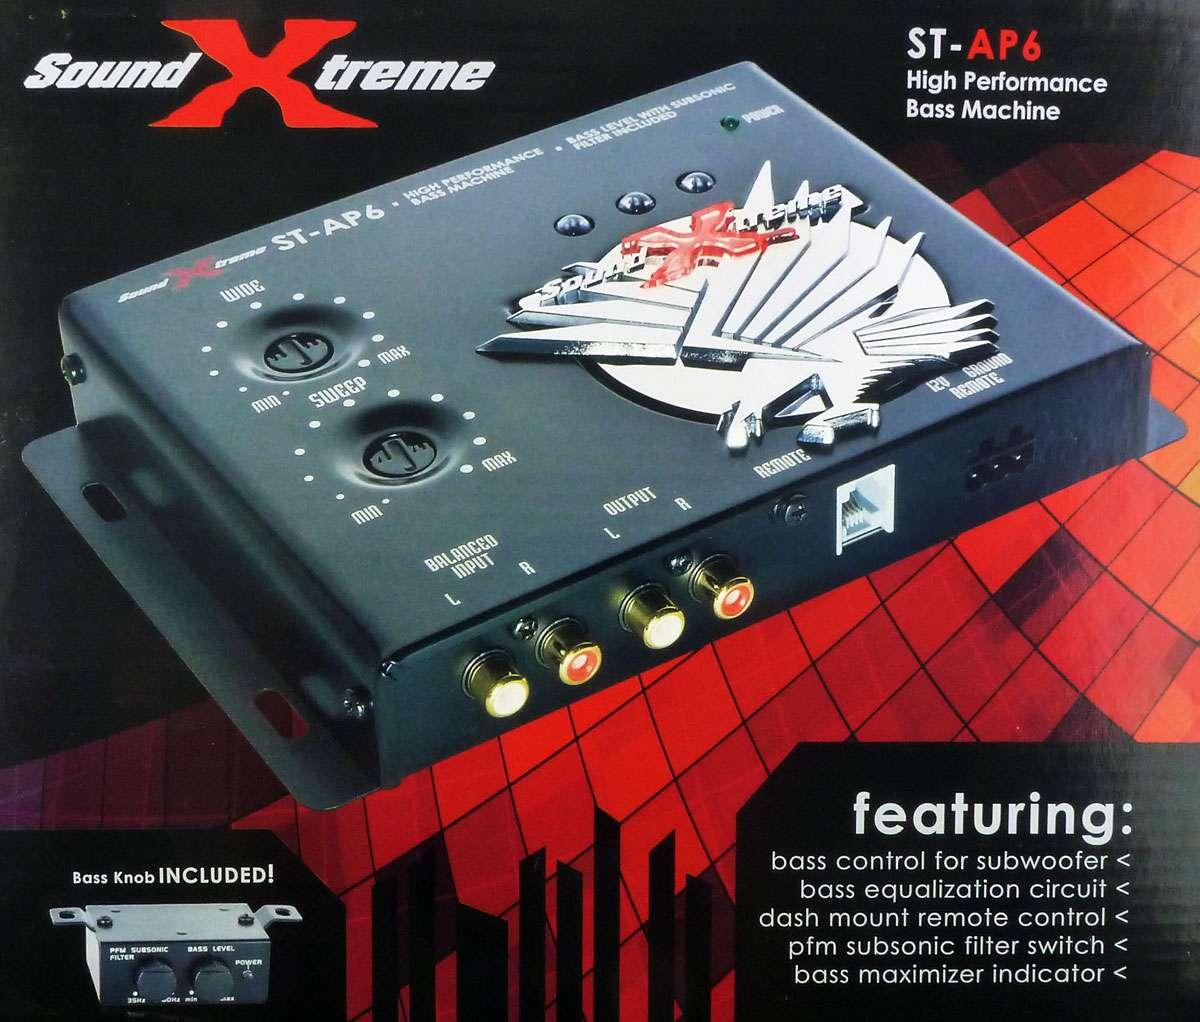 soundstream bass machine